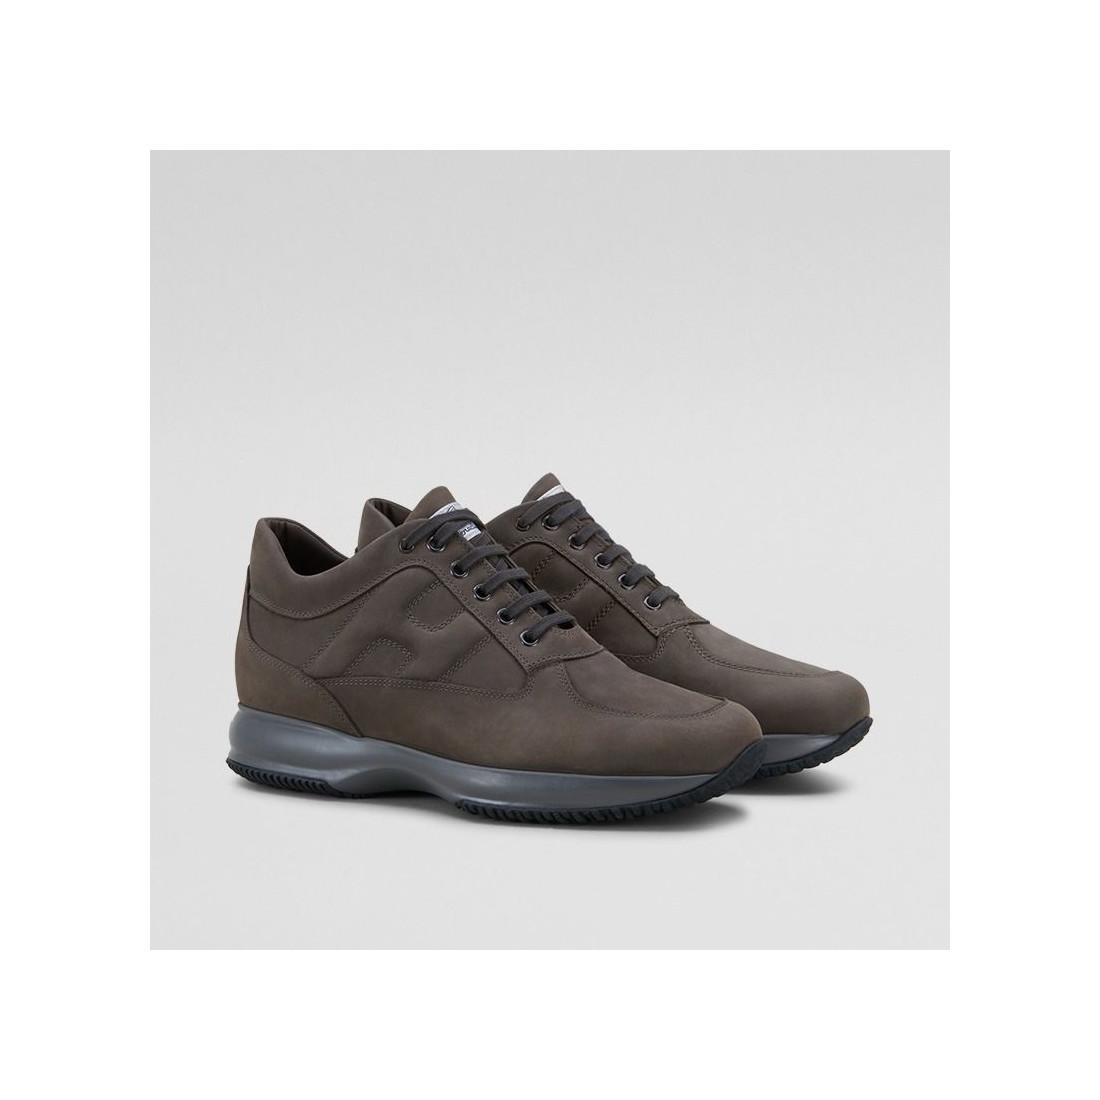 sneakers herren hogan hxm00n00010dscb611 3435